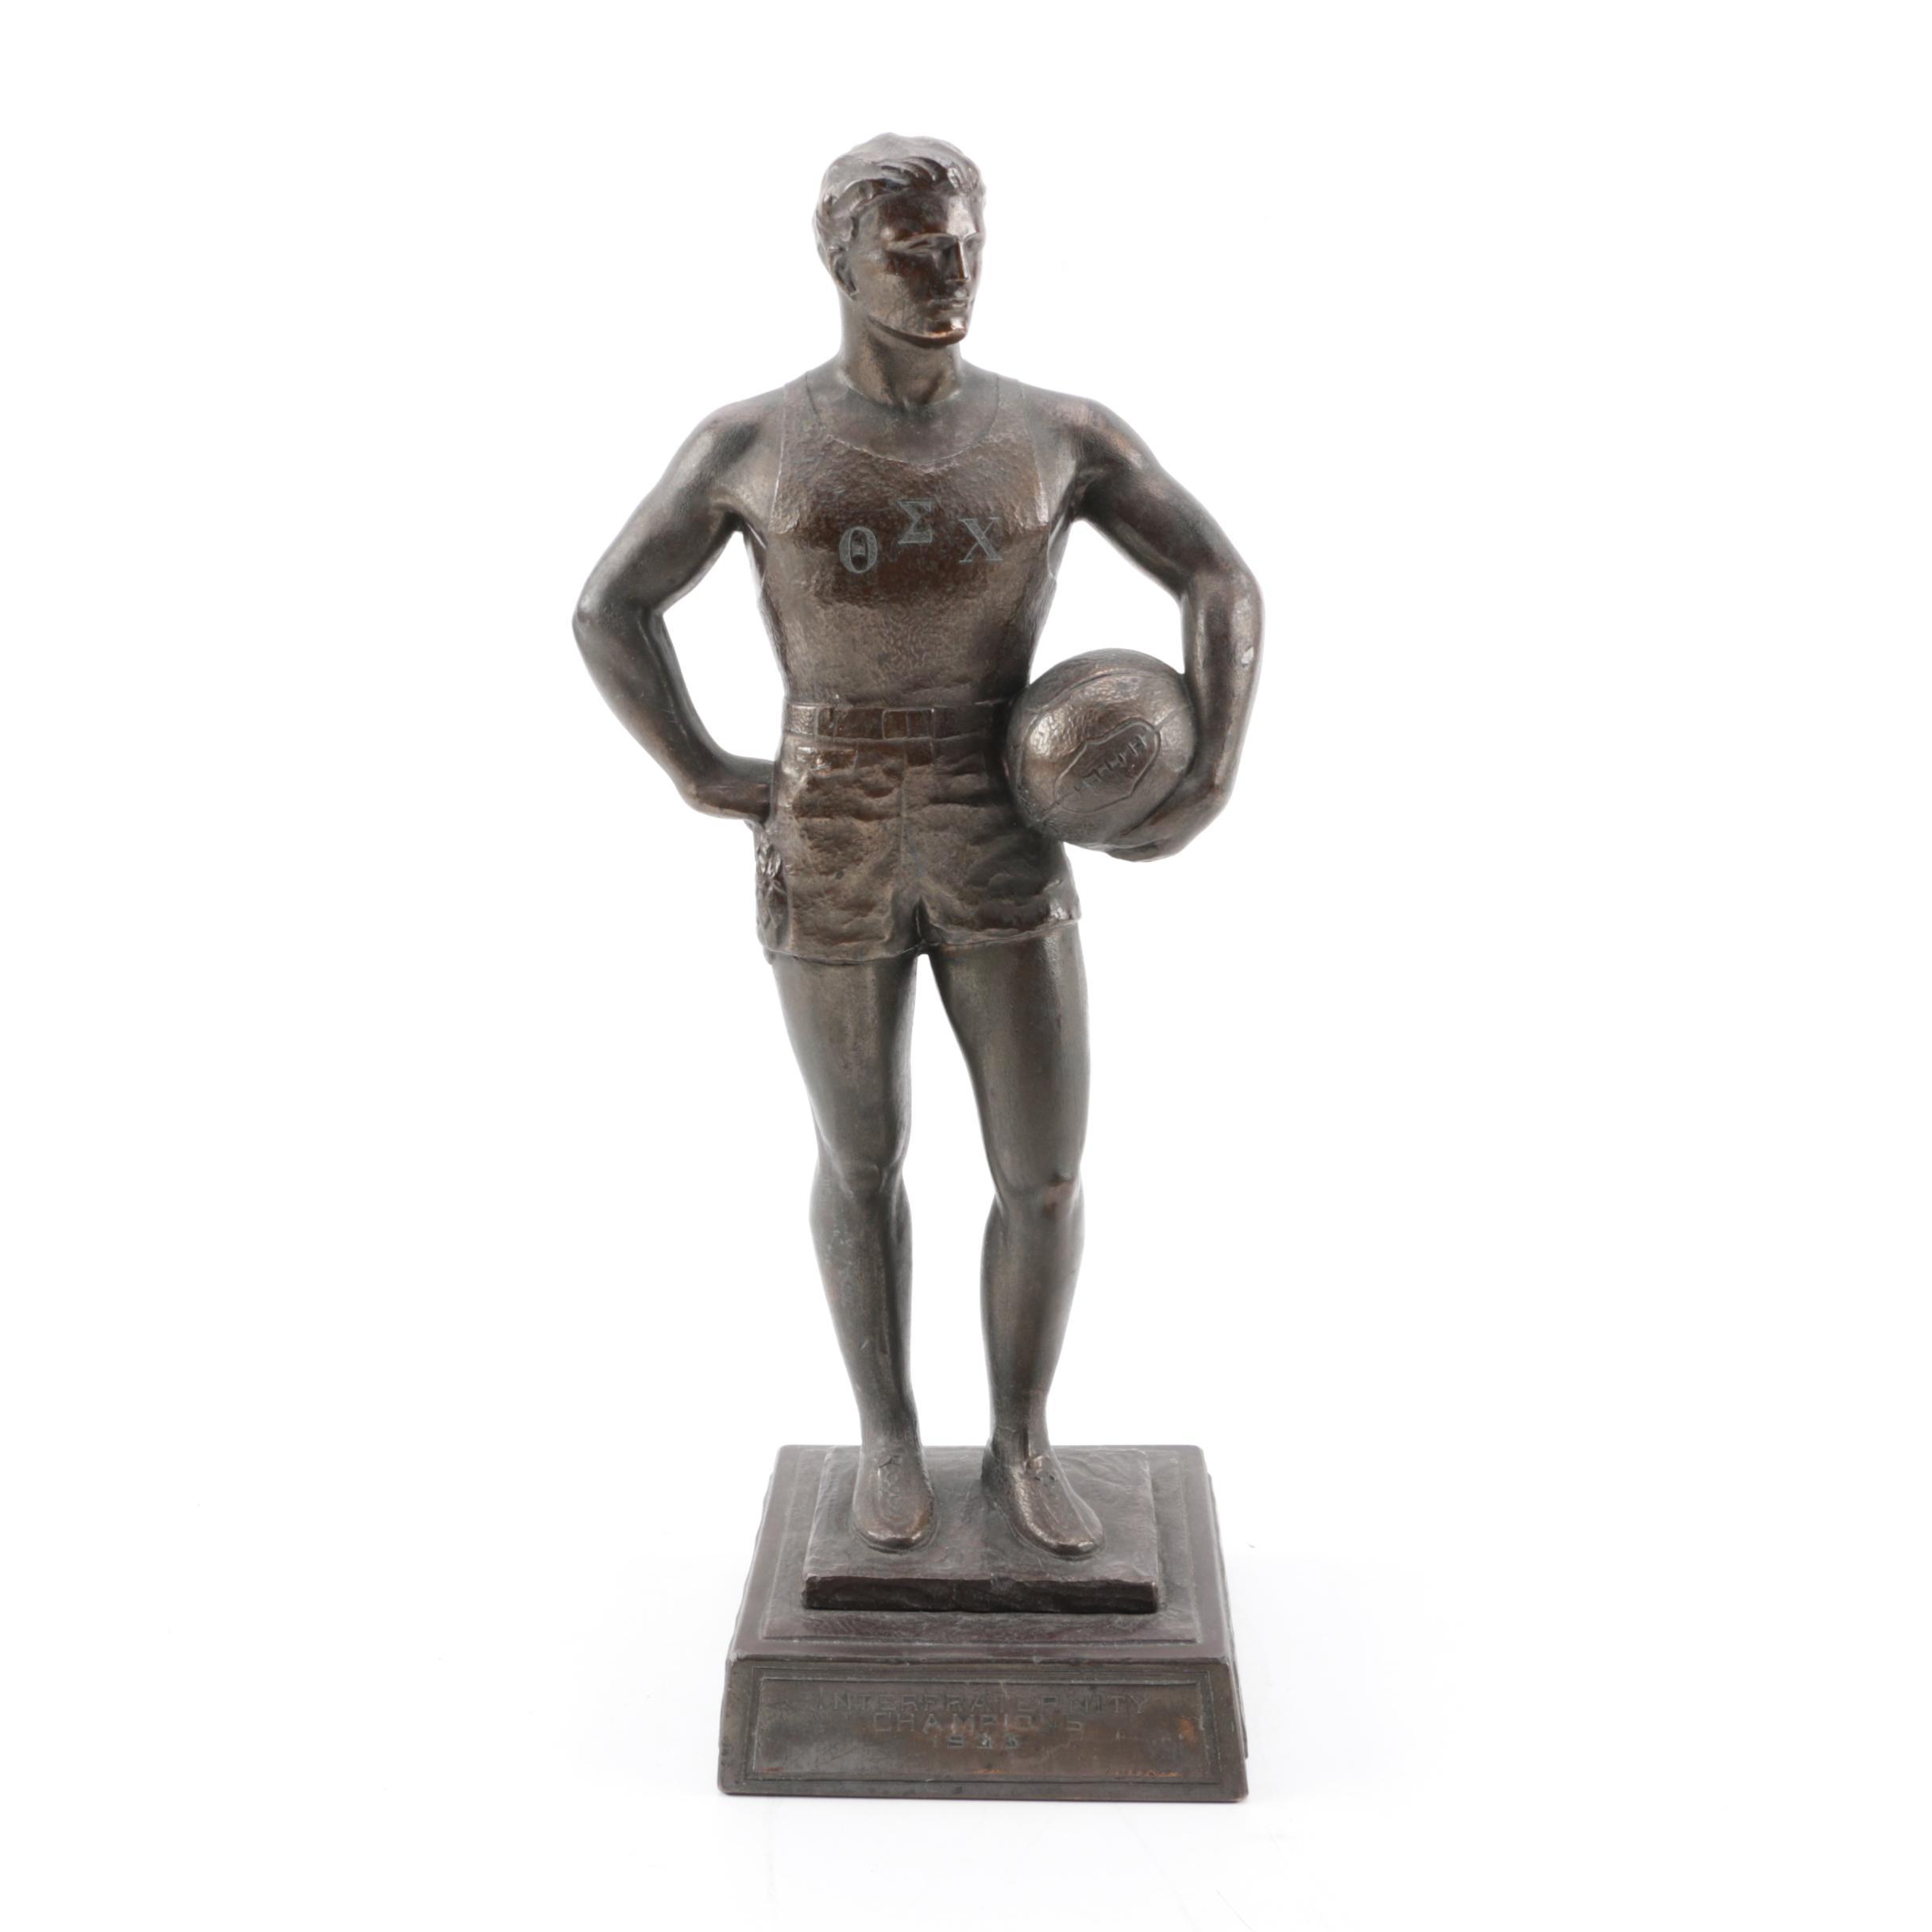 Interfraternity Basketball Championship Bronze Metallic Trophy, 1933